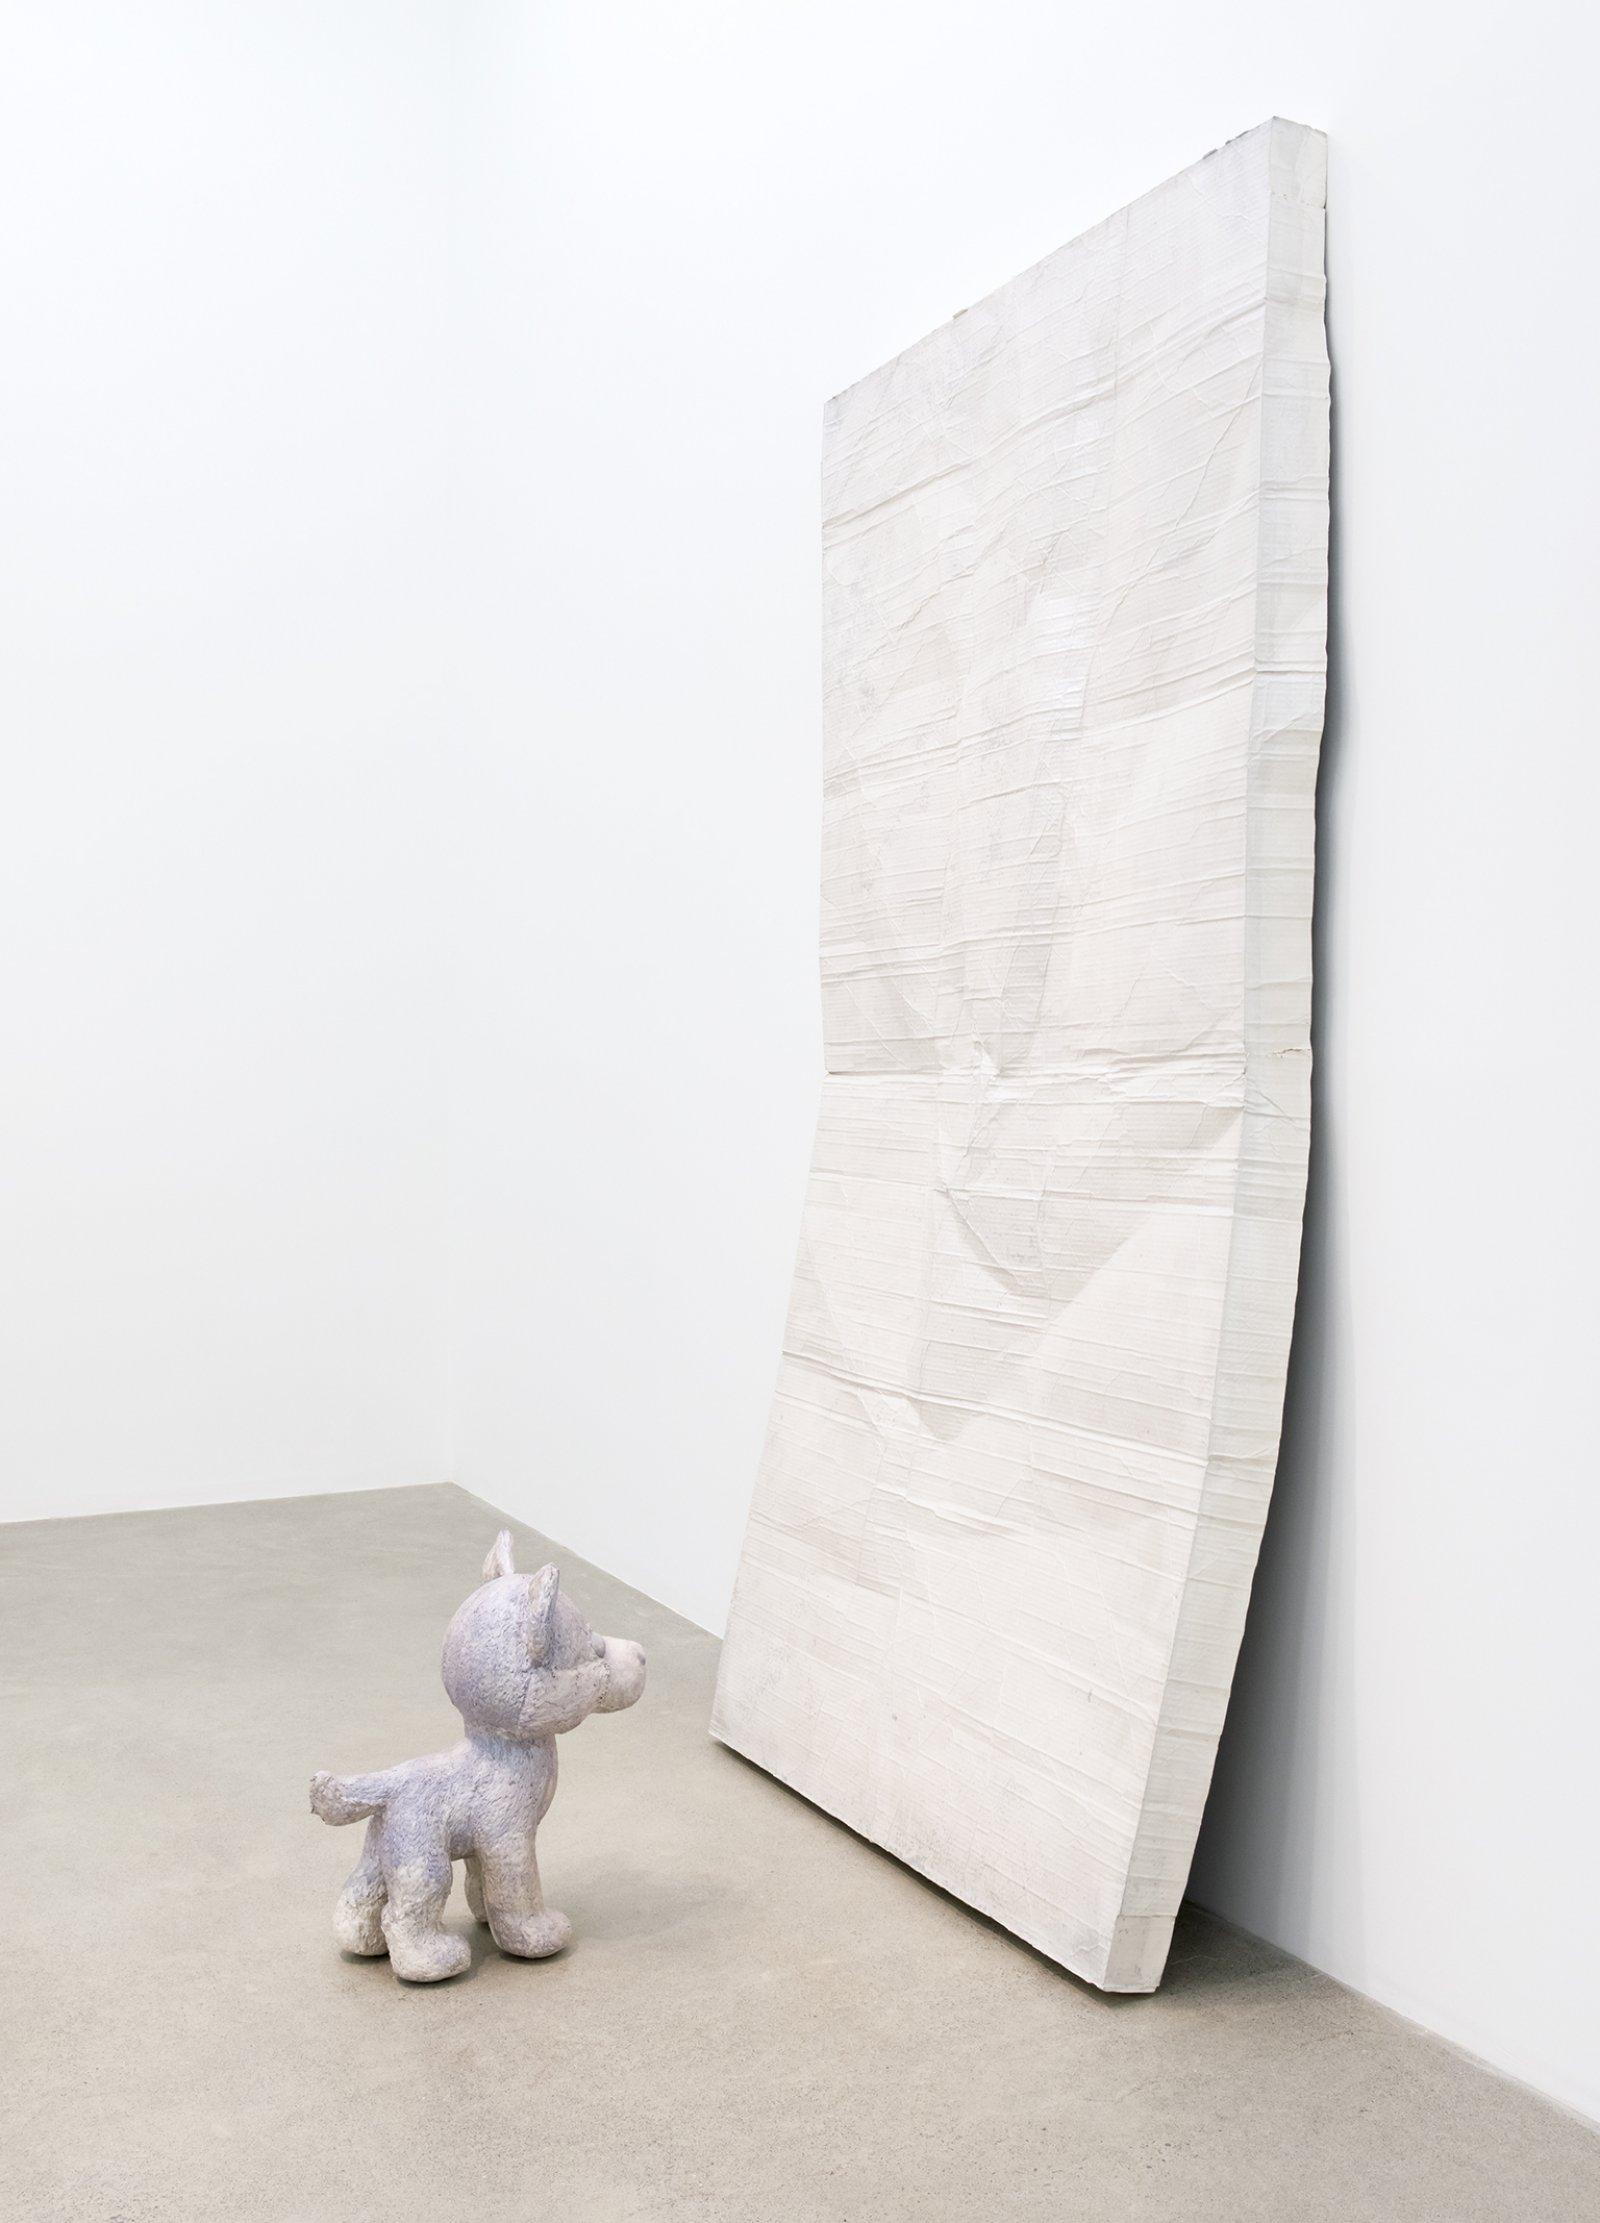 Liz Magor, Membership, 2016, polymerized gypsum, 96 x 53 x 47 in. (244 x 133 x 119 cm) by Liz Magor